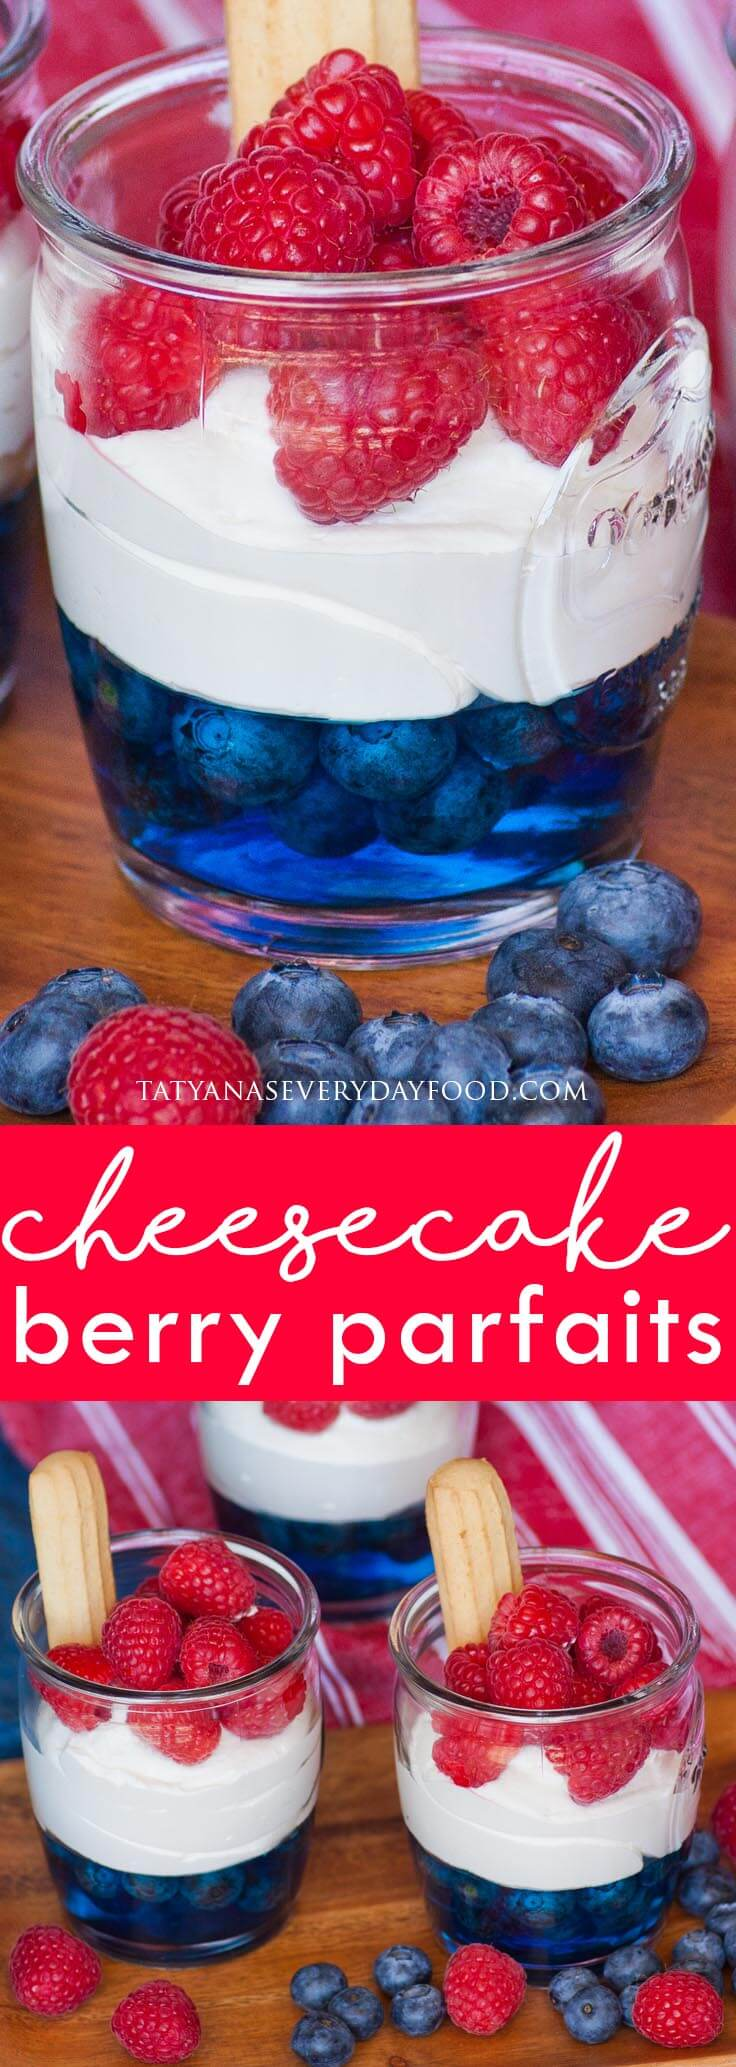 Blueberry Raspberry Cheesecake Parfait